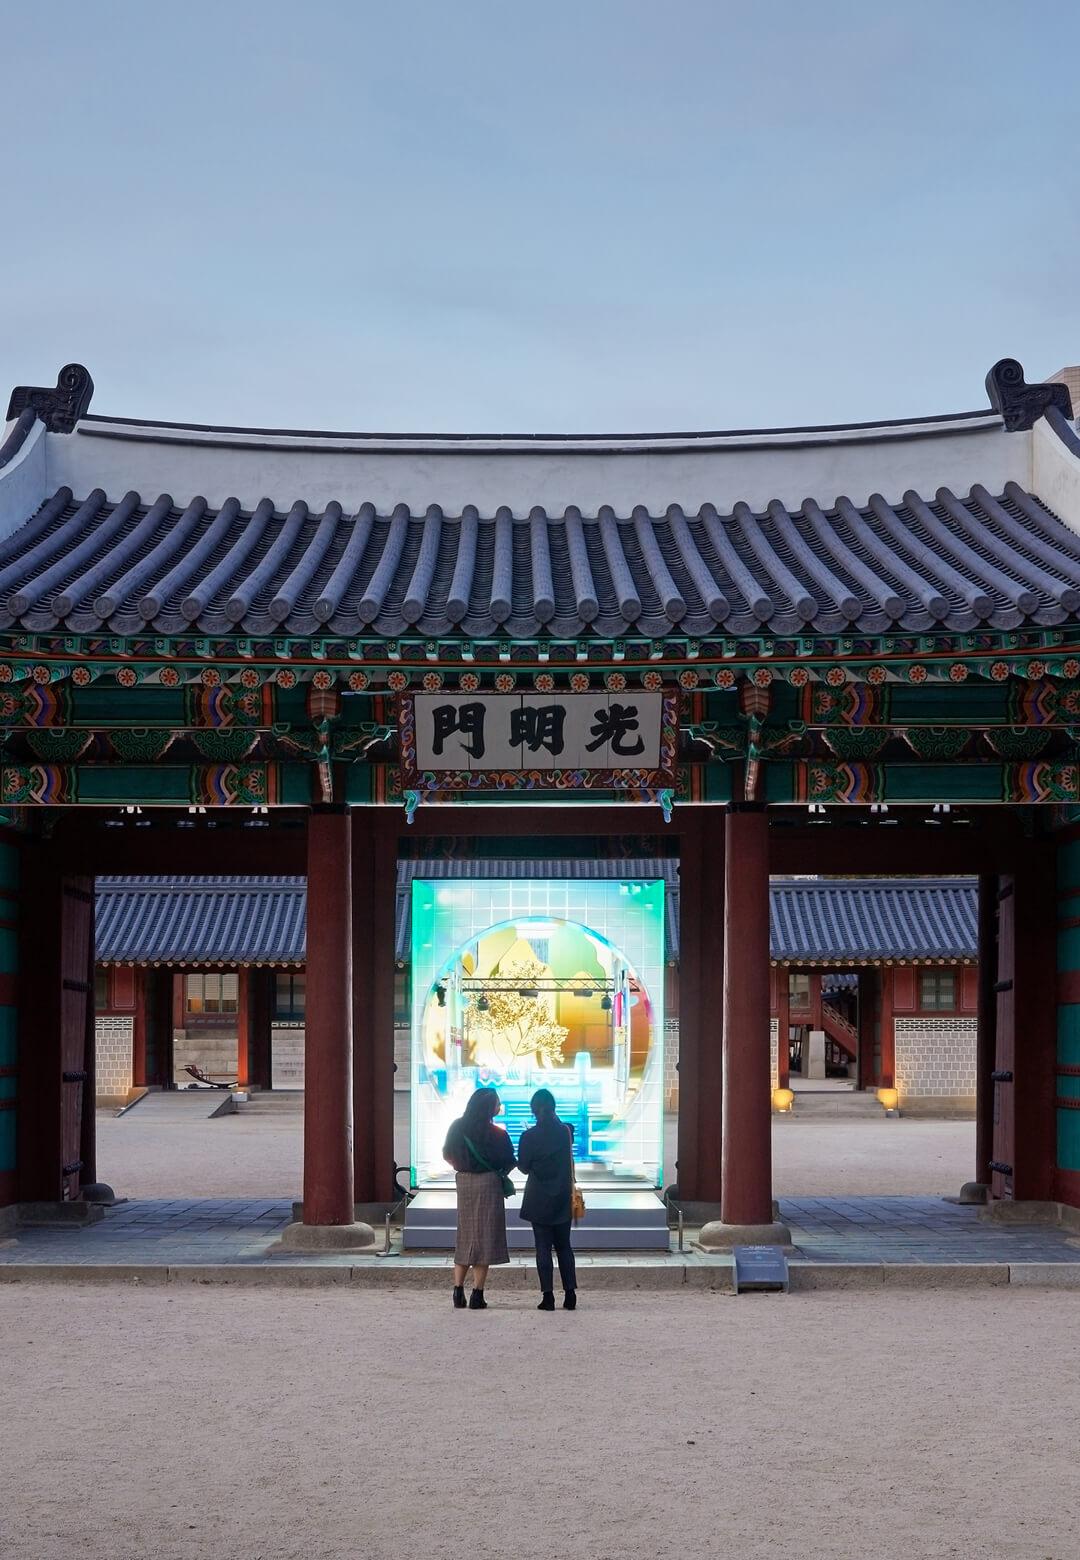 'Gate of Bright Lights' in Seoul, South Korea   Gate of Bright Lights   Space Popular   STIRworld